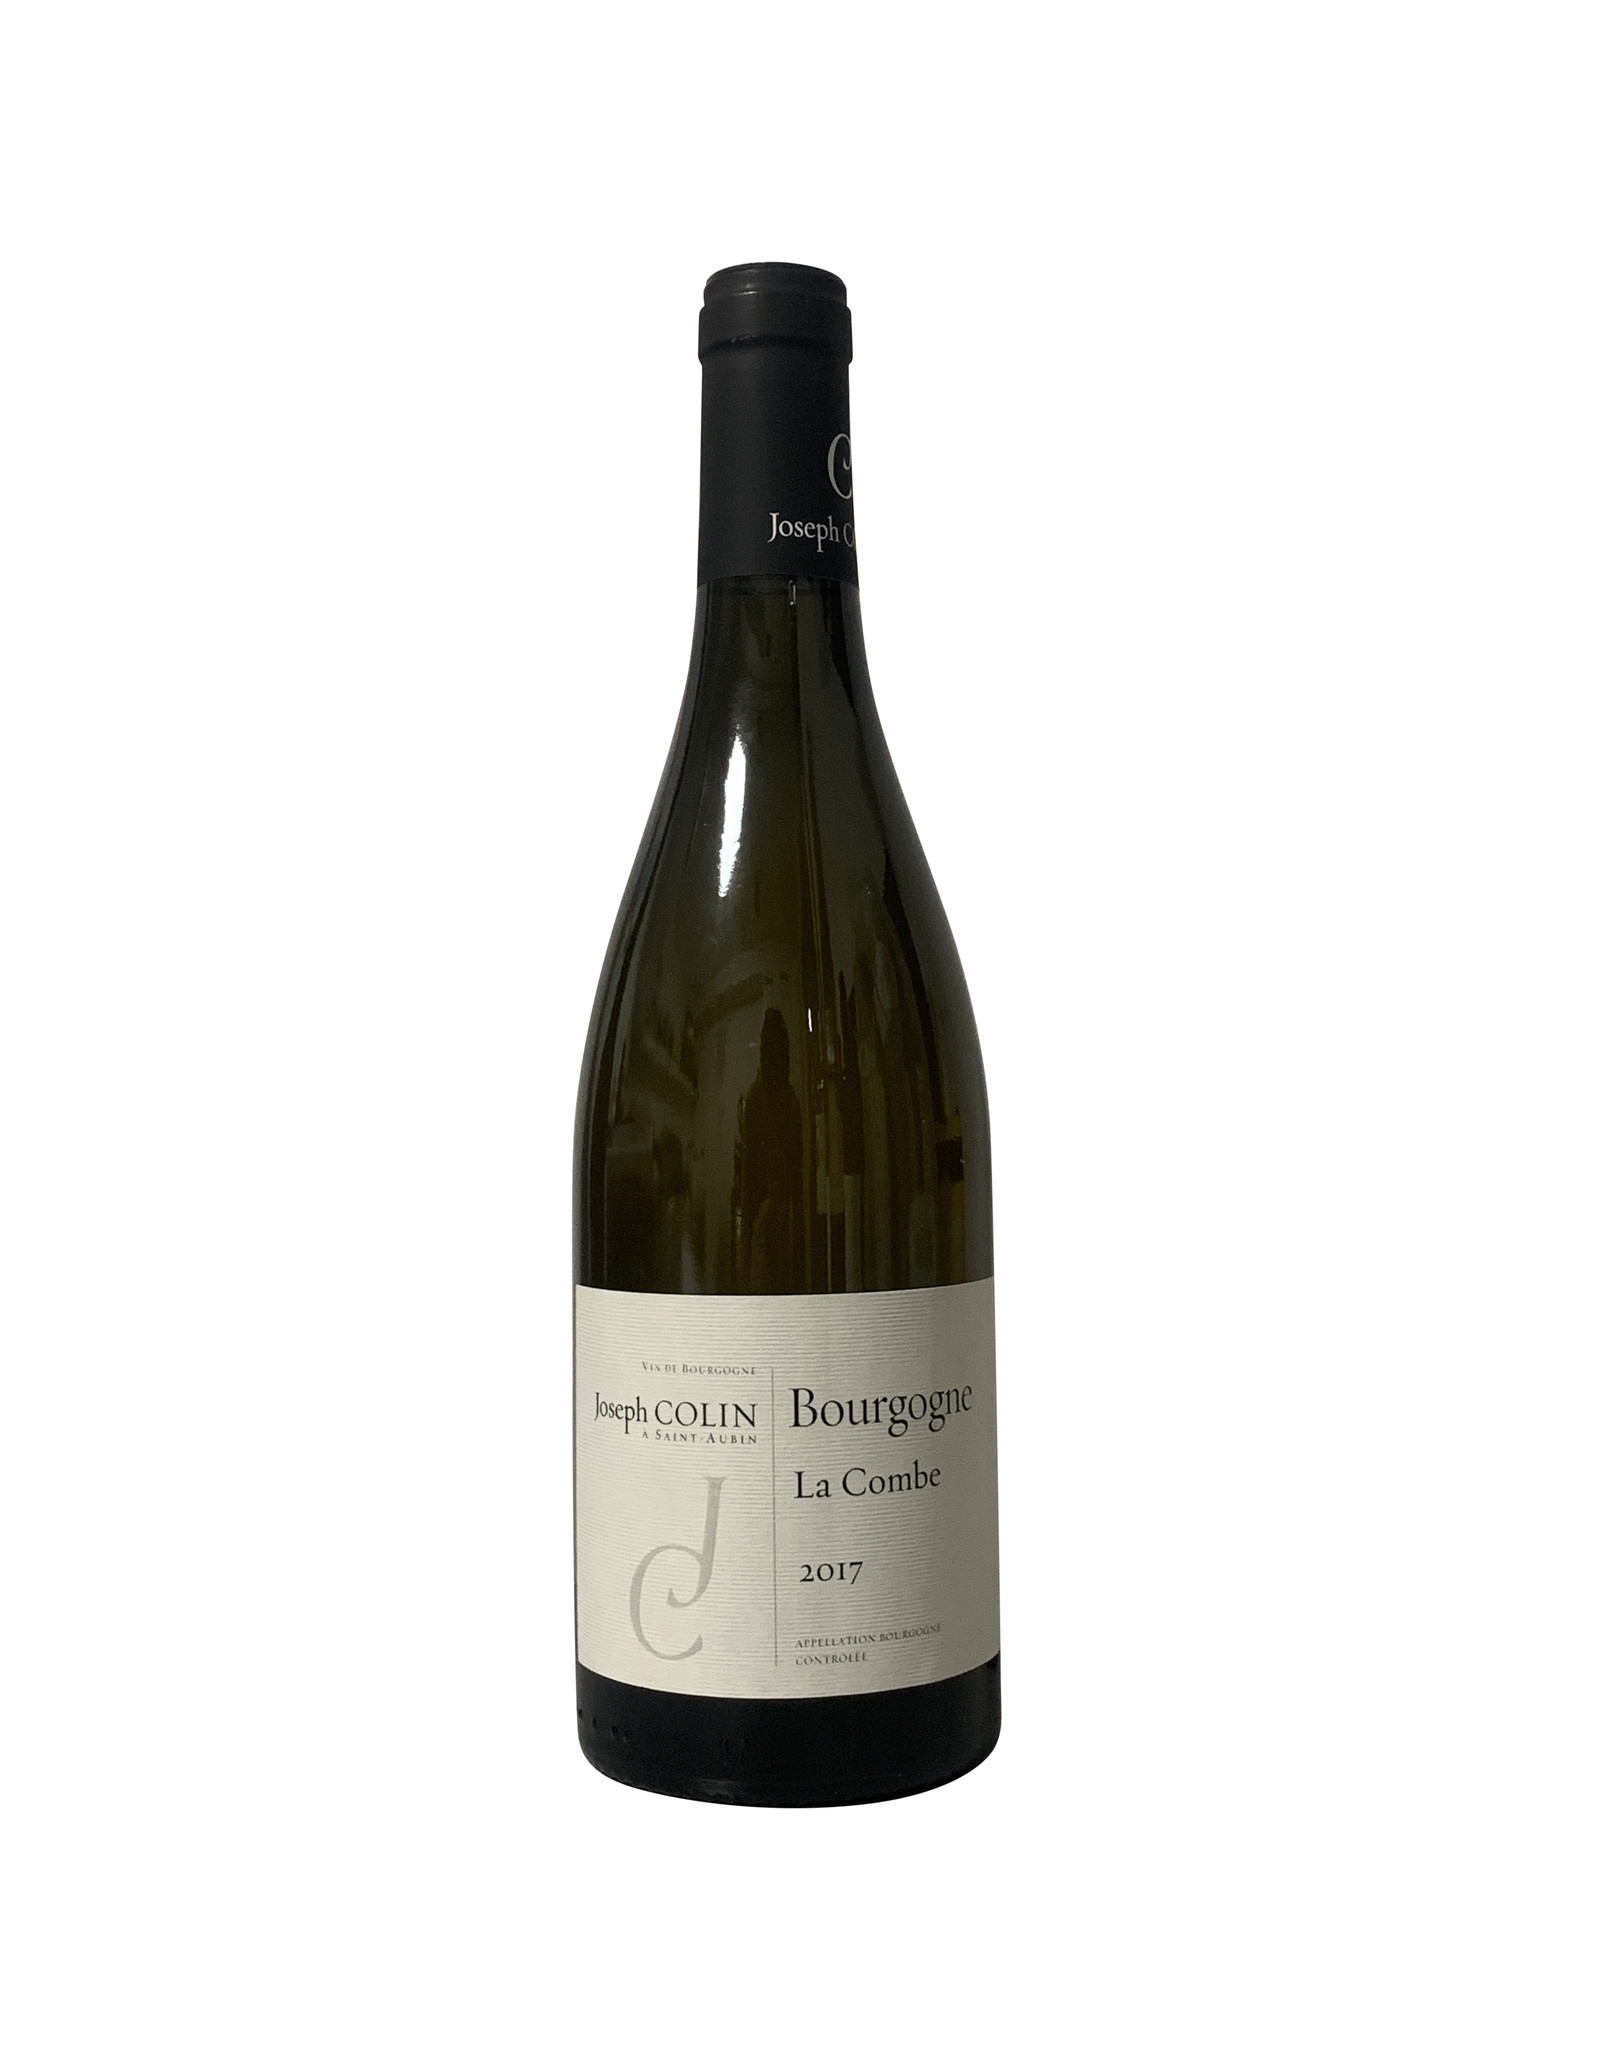 "Joseph Colin Joseph Colin Bourgogne Blanc ""La Combe"" 2017, Burgundy, France (750mL)"